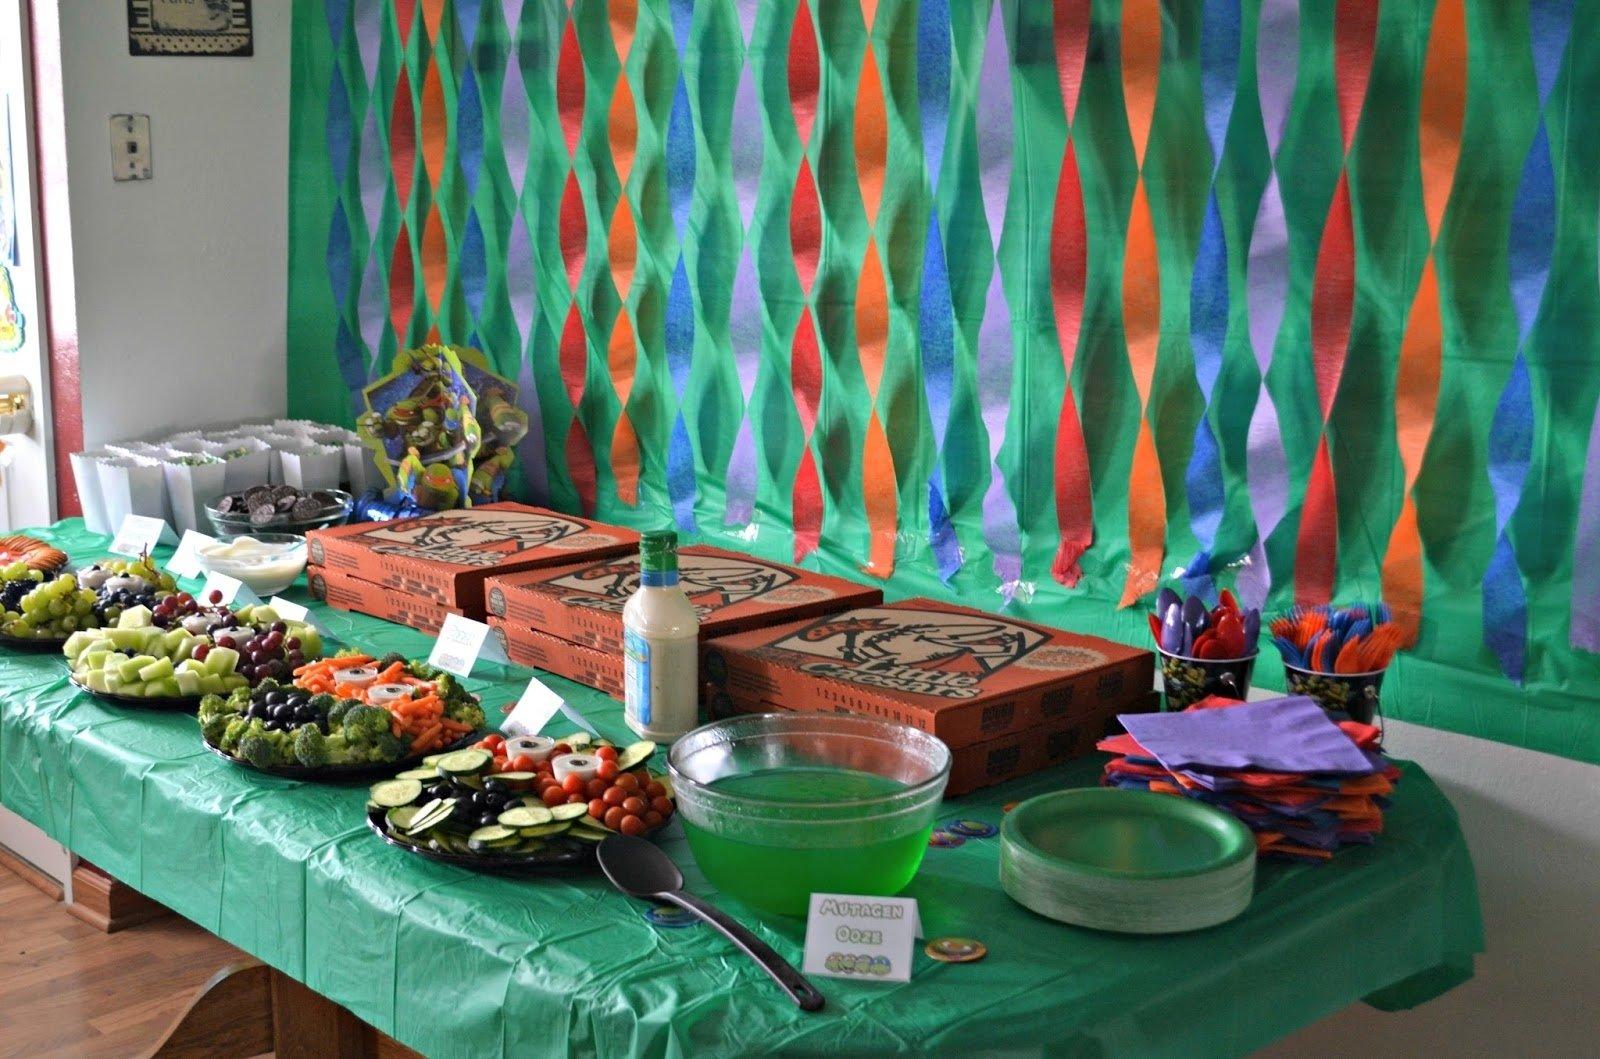 10 Best Ninja Turtle Party Decoration Ideas shocking teenage mutant ninja turtle birthday party building our 1 2020